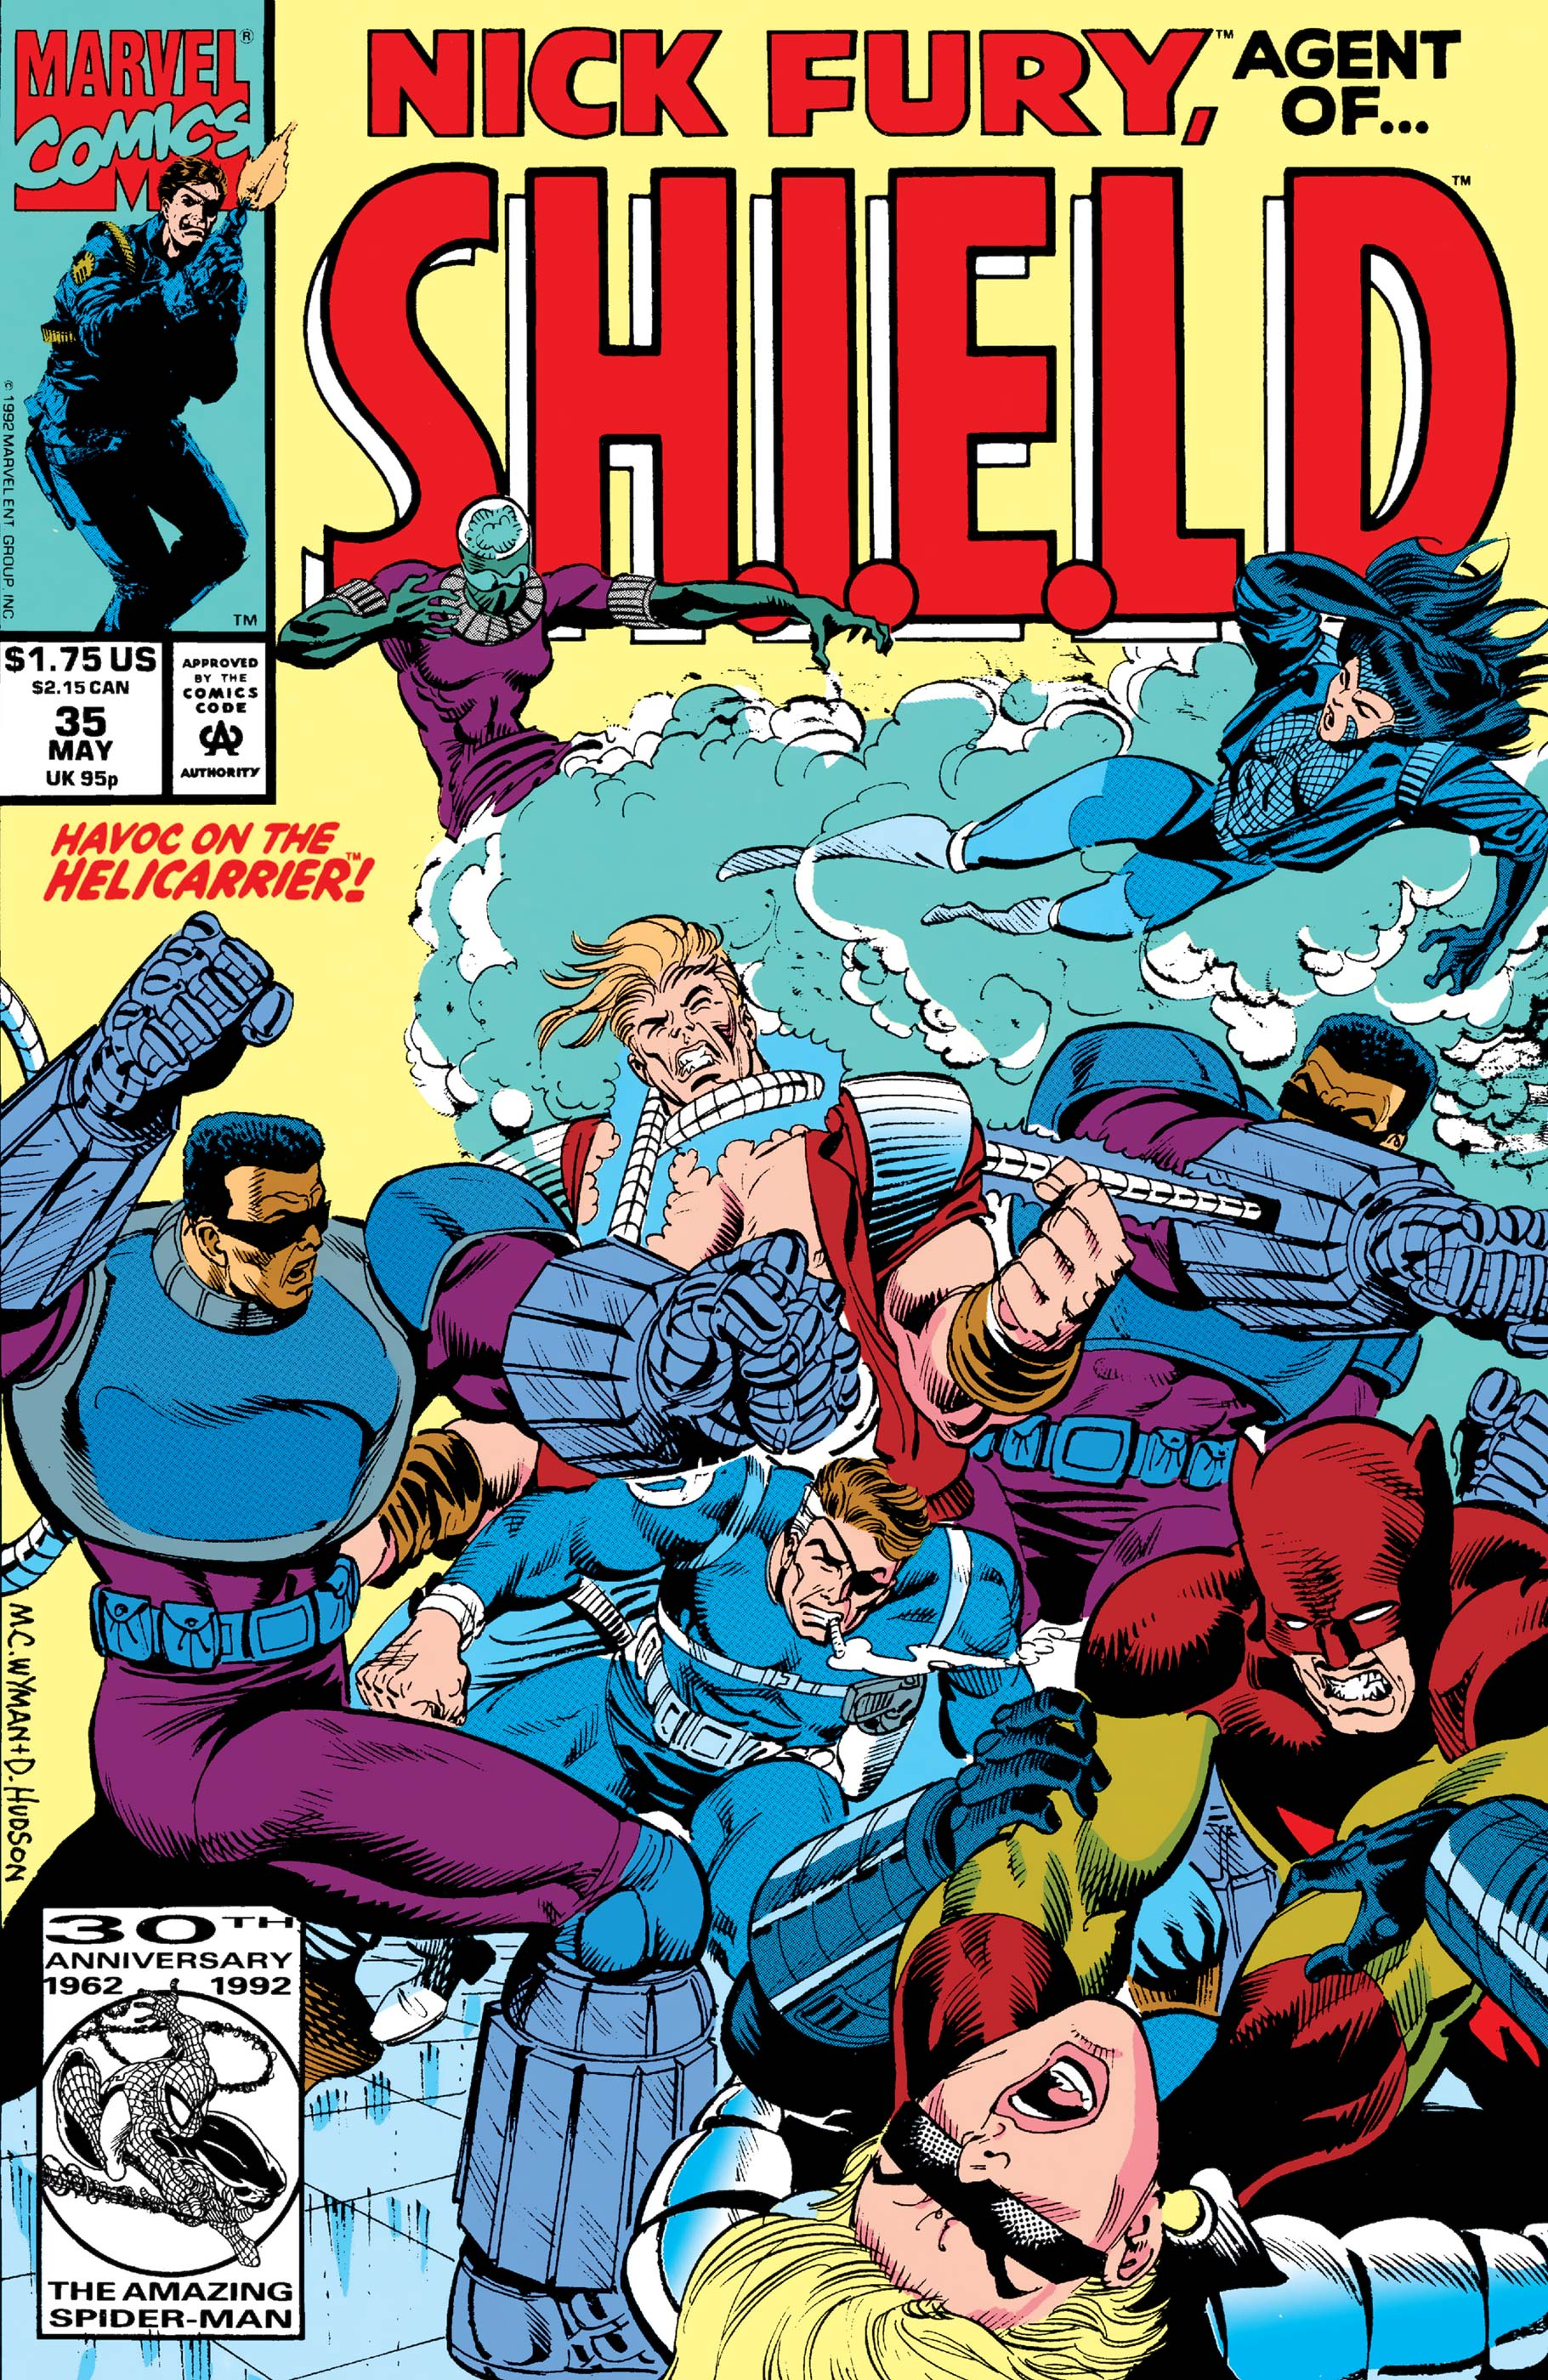 Nick Fury, Agent of S.H.I.E.L.D. (1989) #35